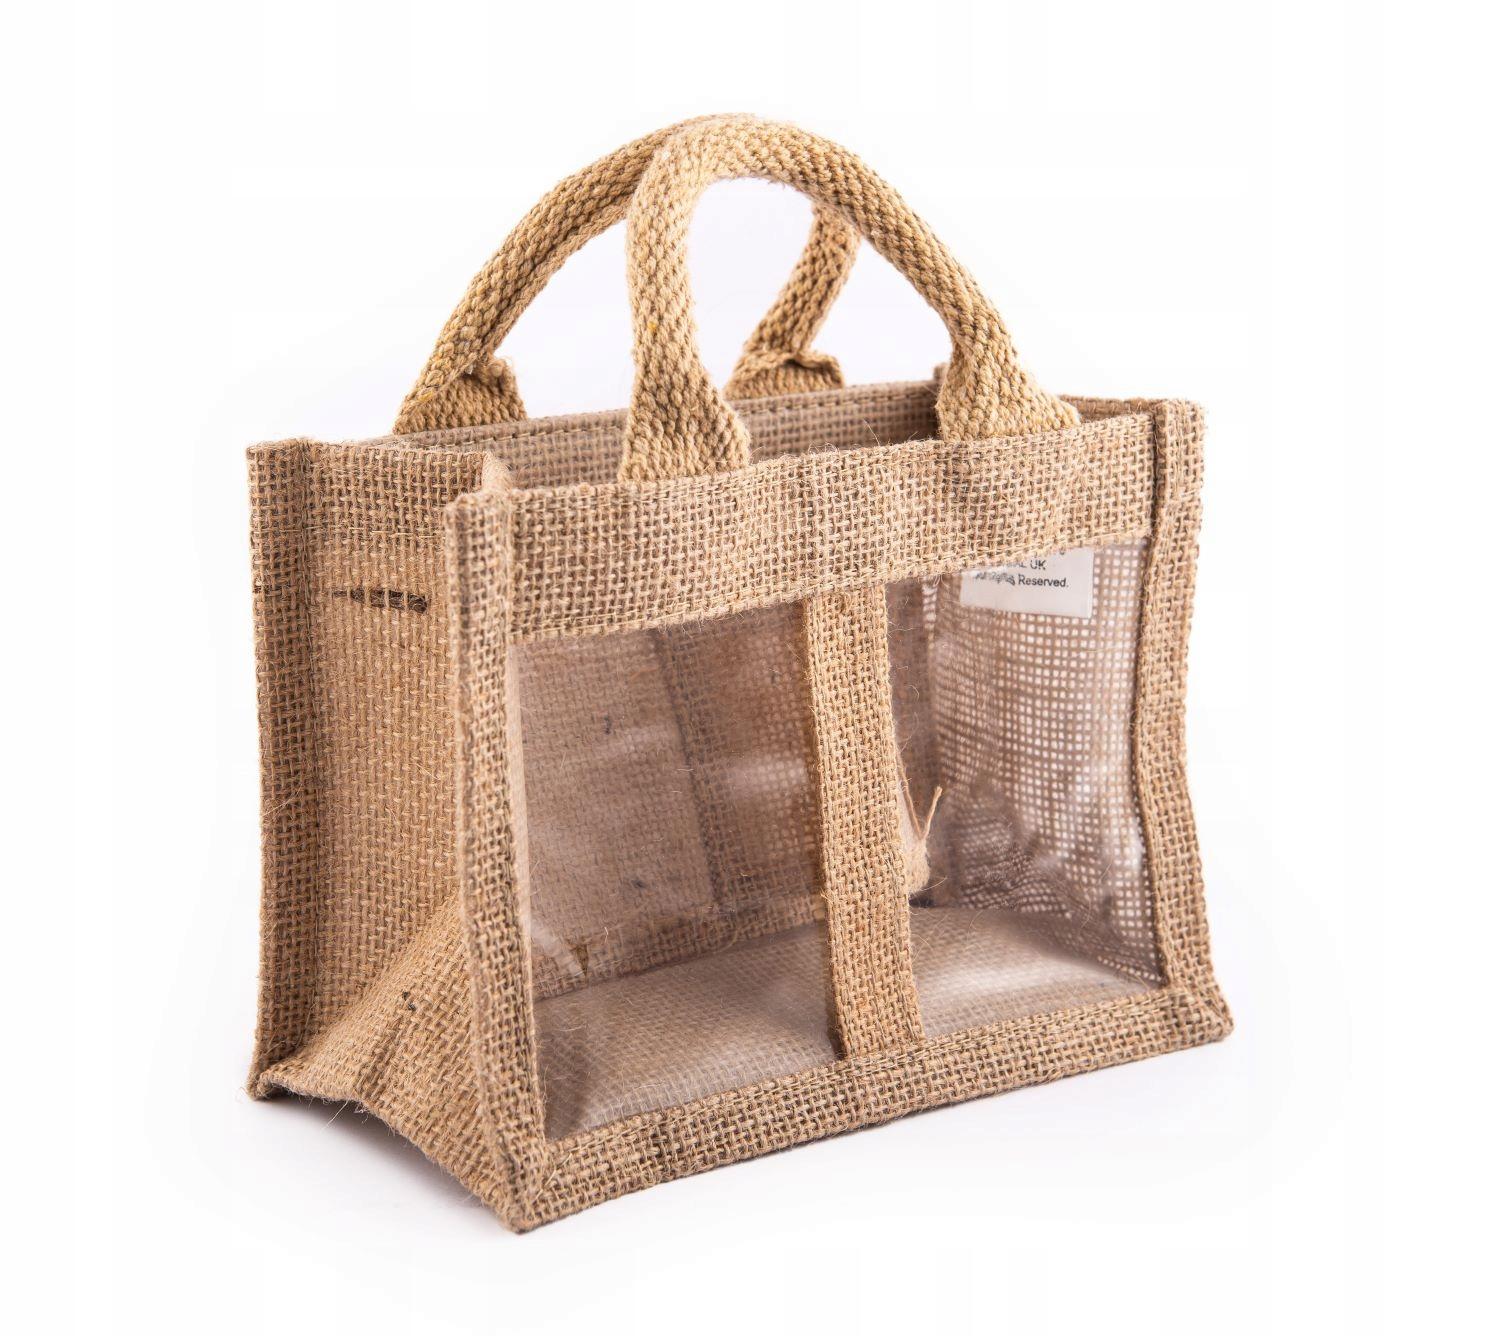 подарочная сумка из эко-джута Natural Present